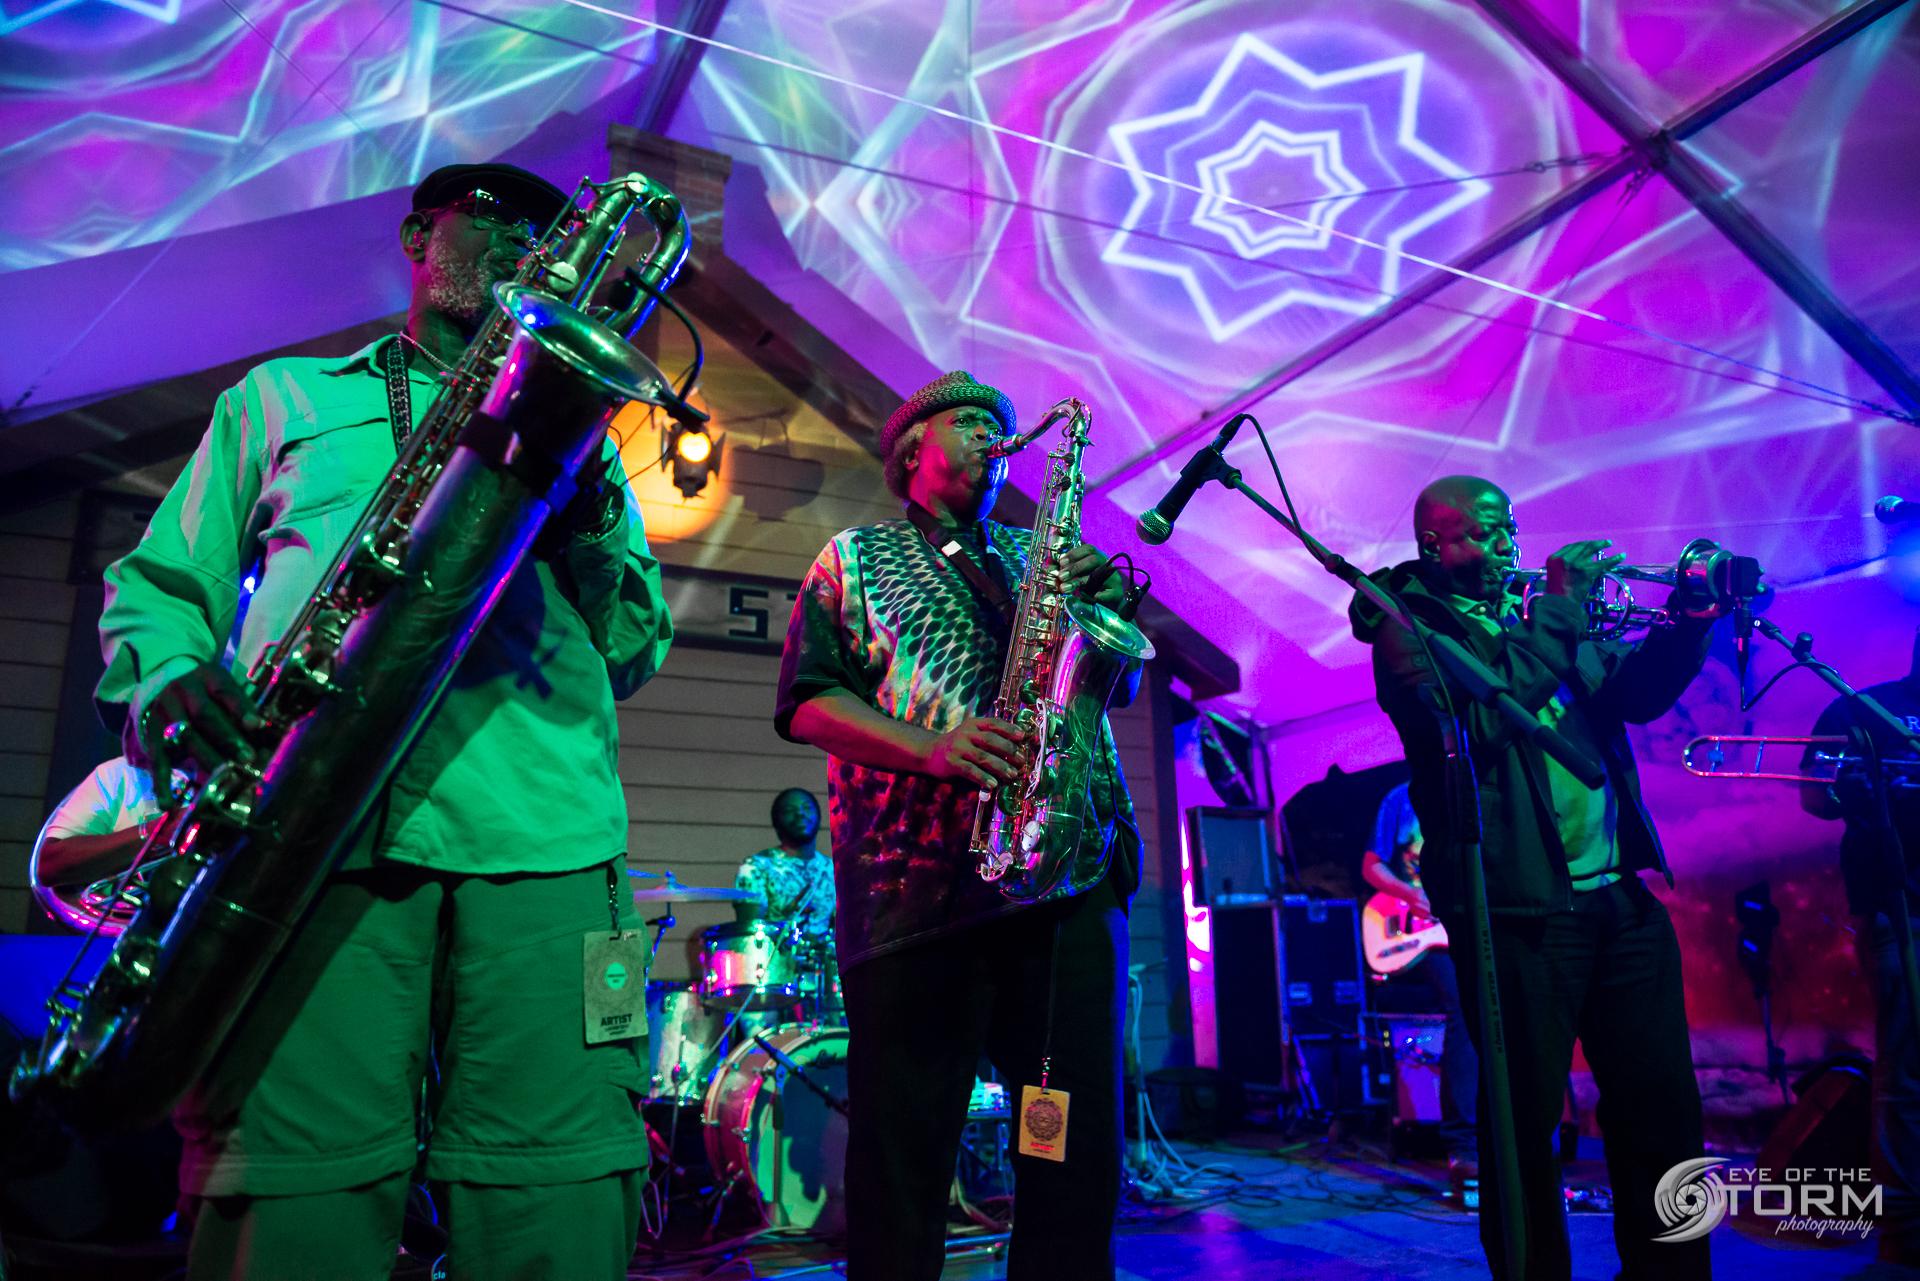 Dirty Dozen Brass Band - 2017-08-26 // Lockn' Music Festival // Arrington, VA